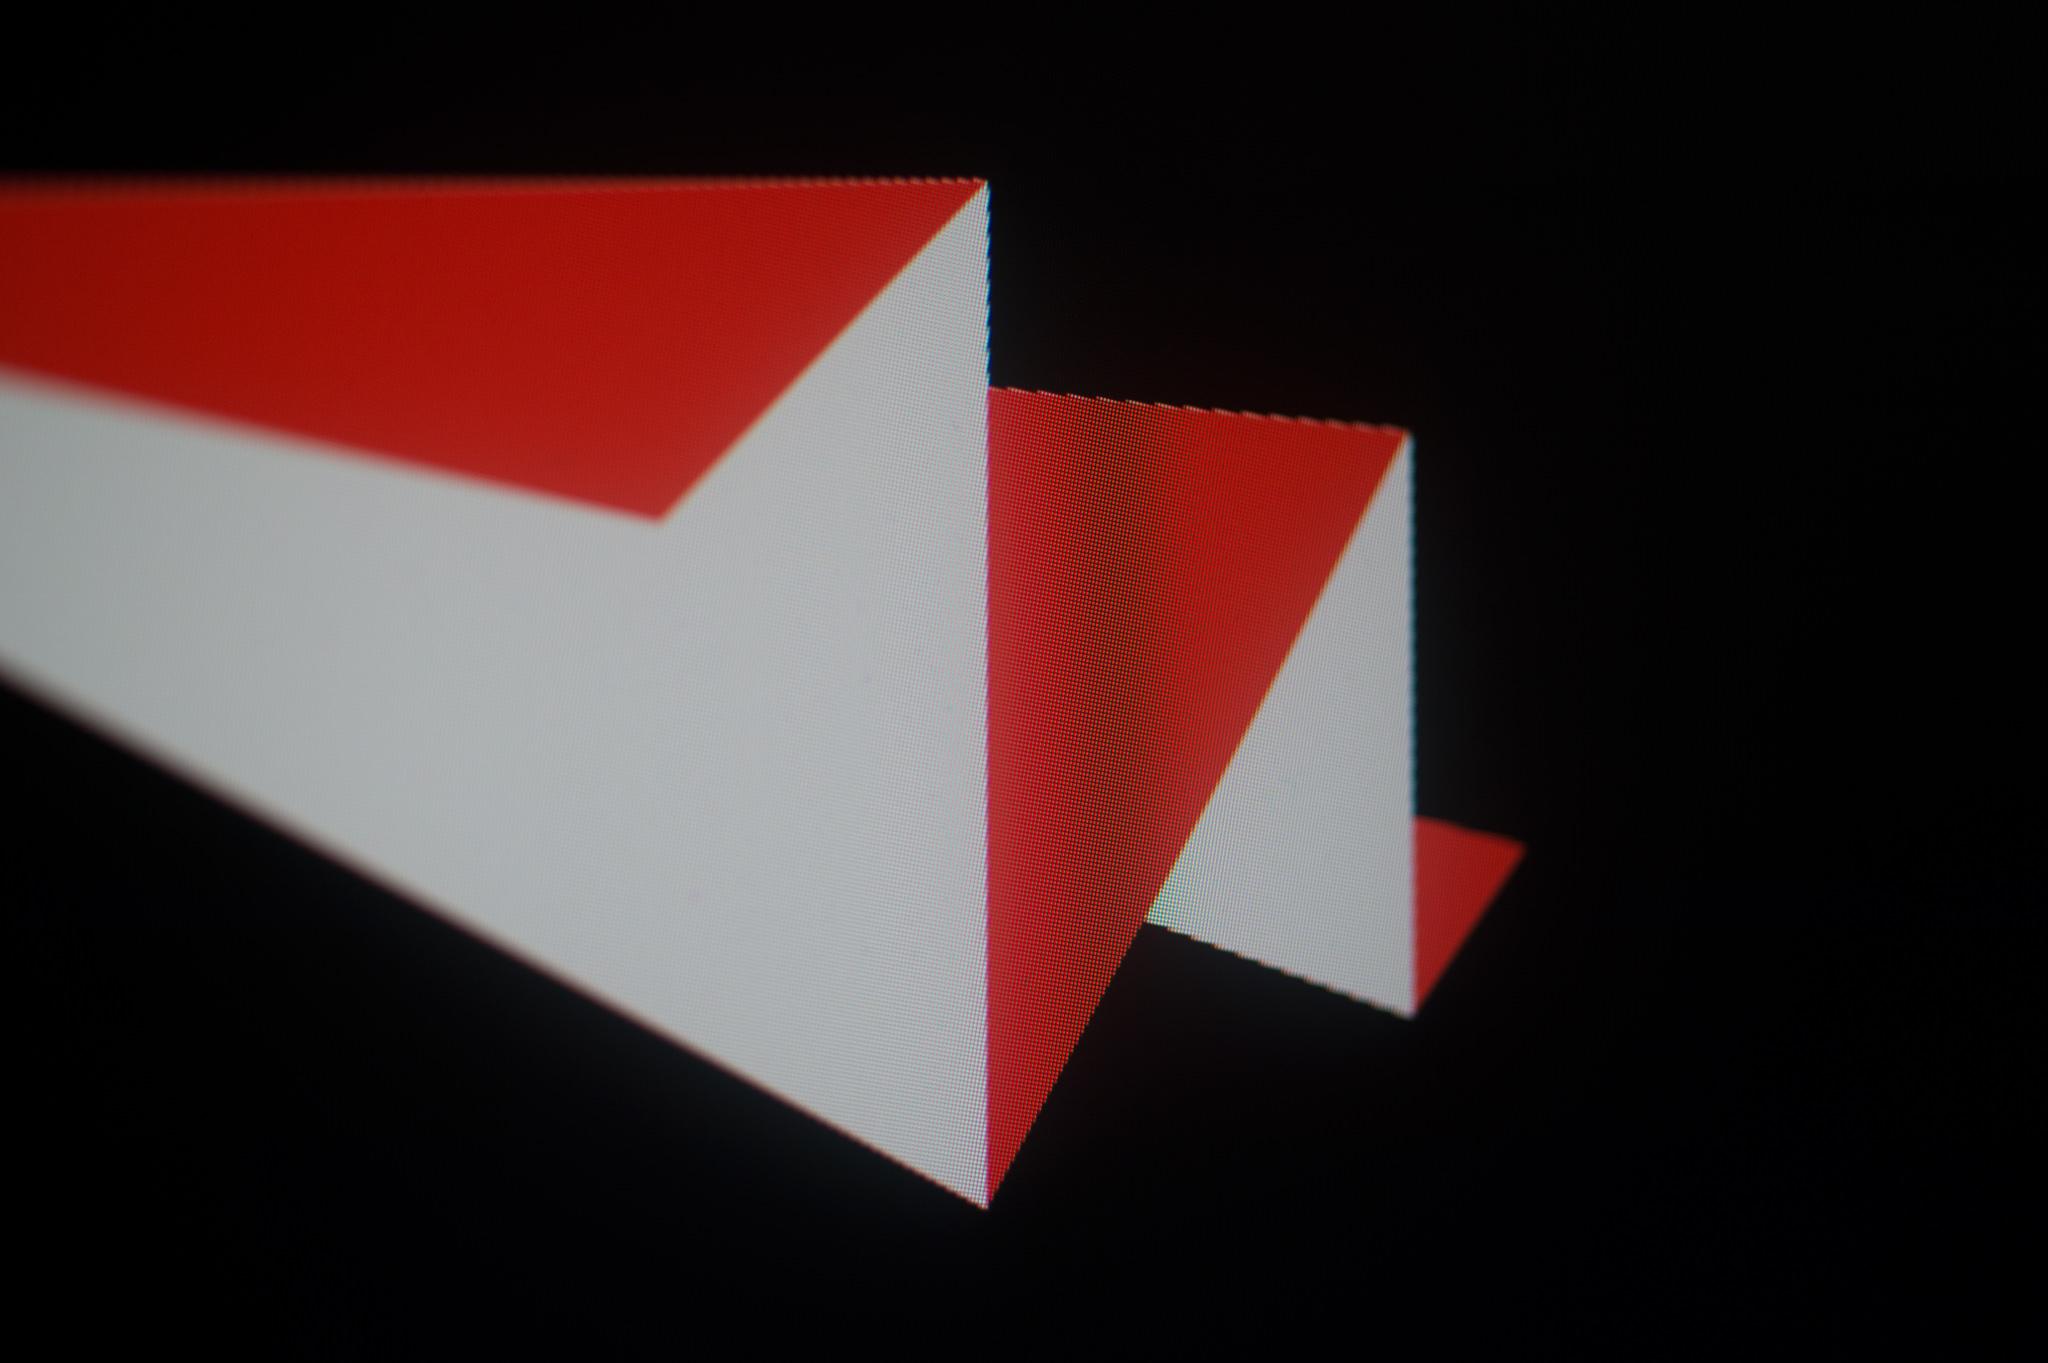 GD_ZVL_logo_10